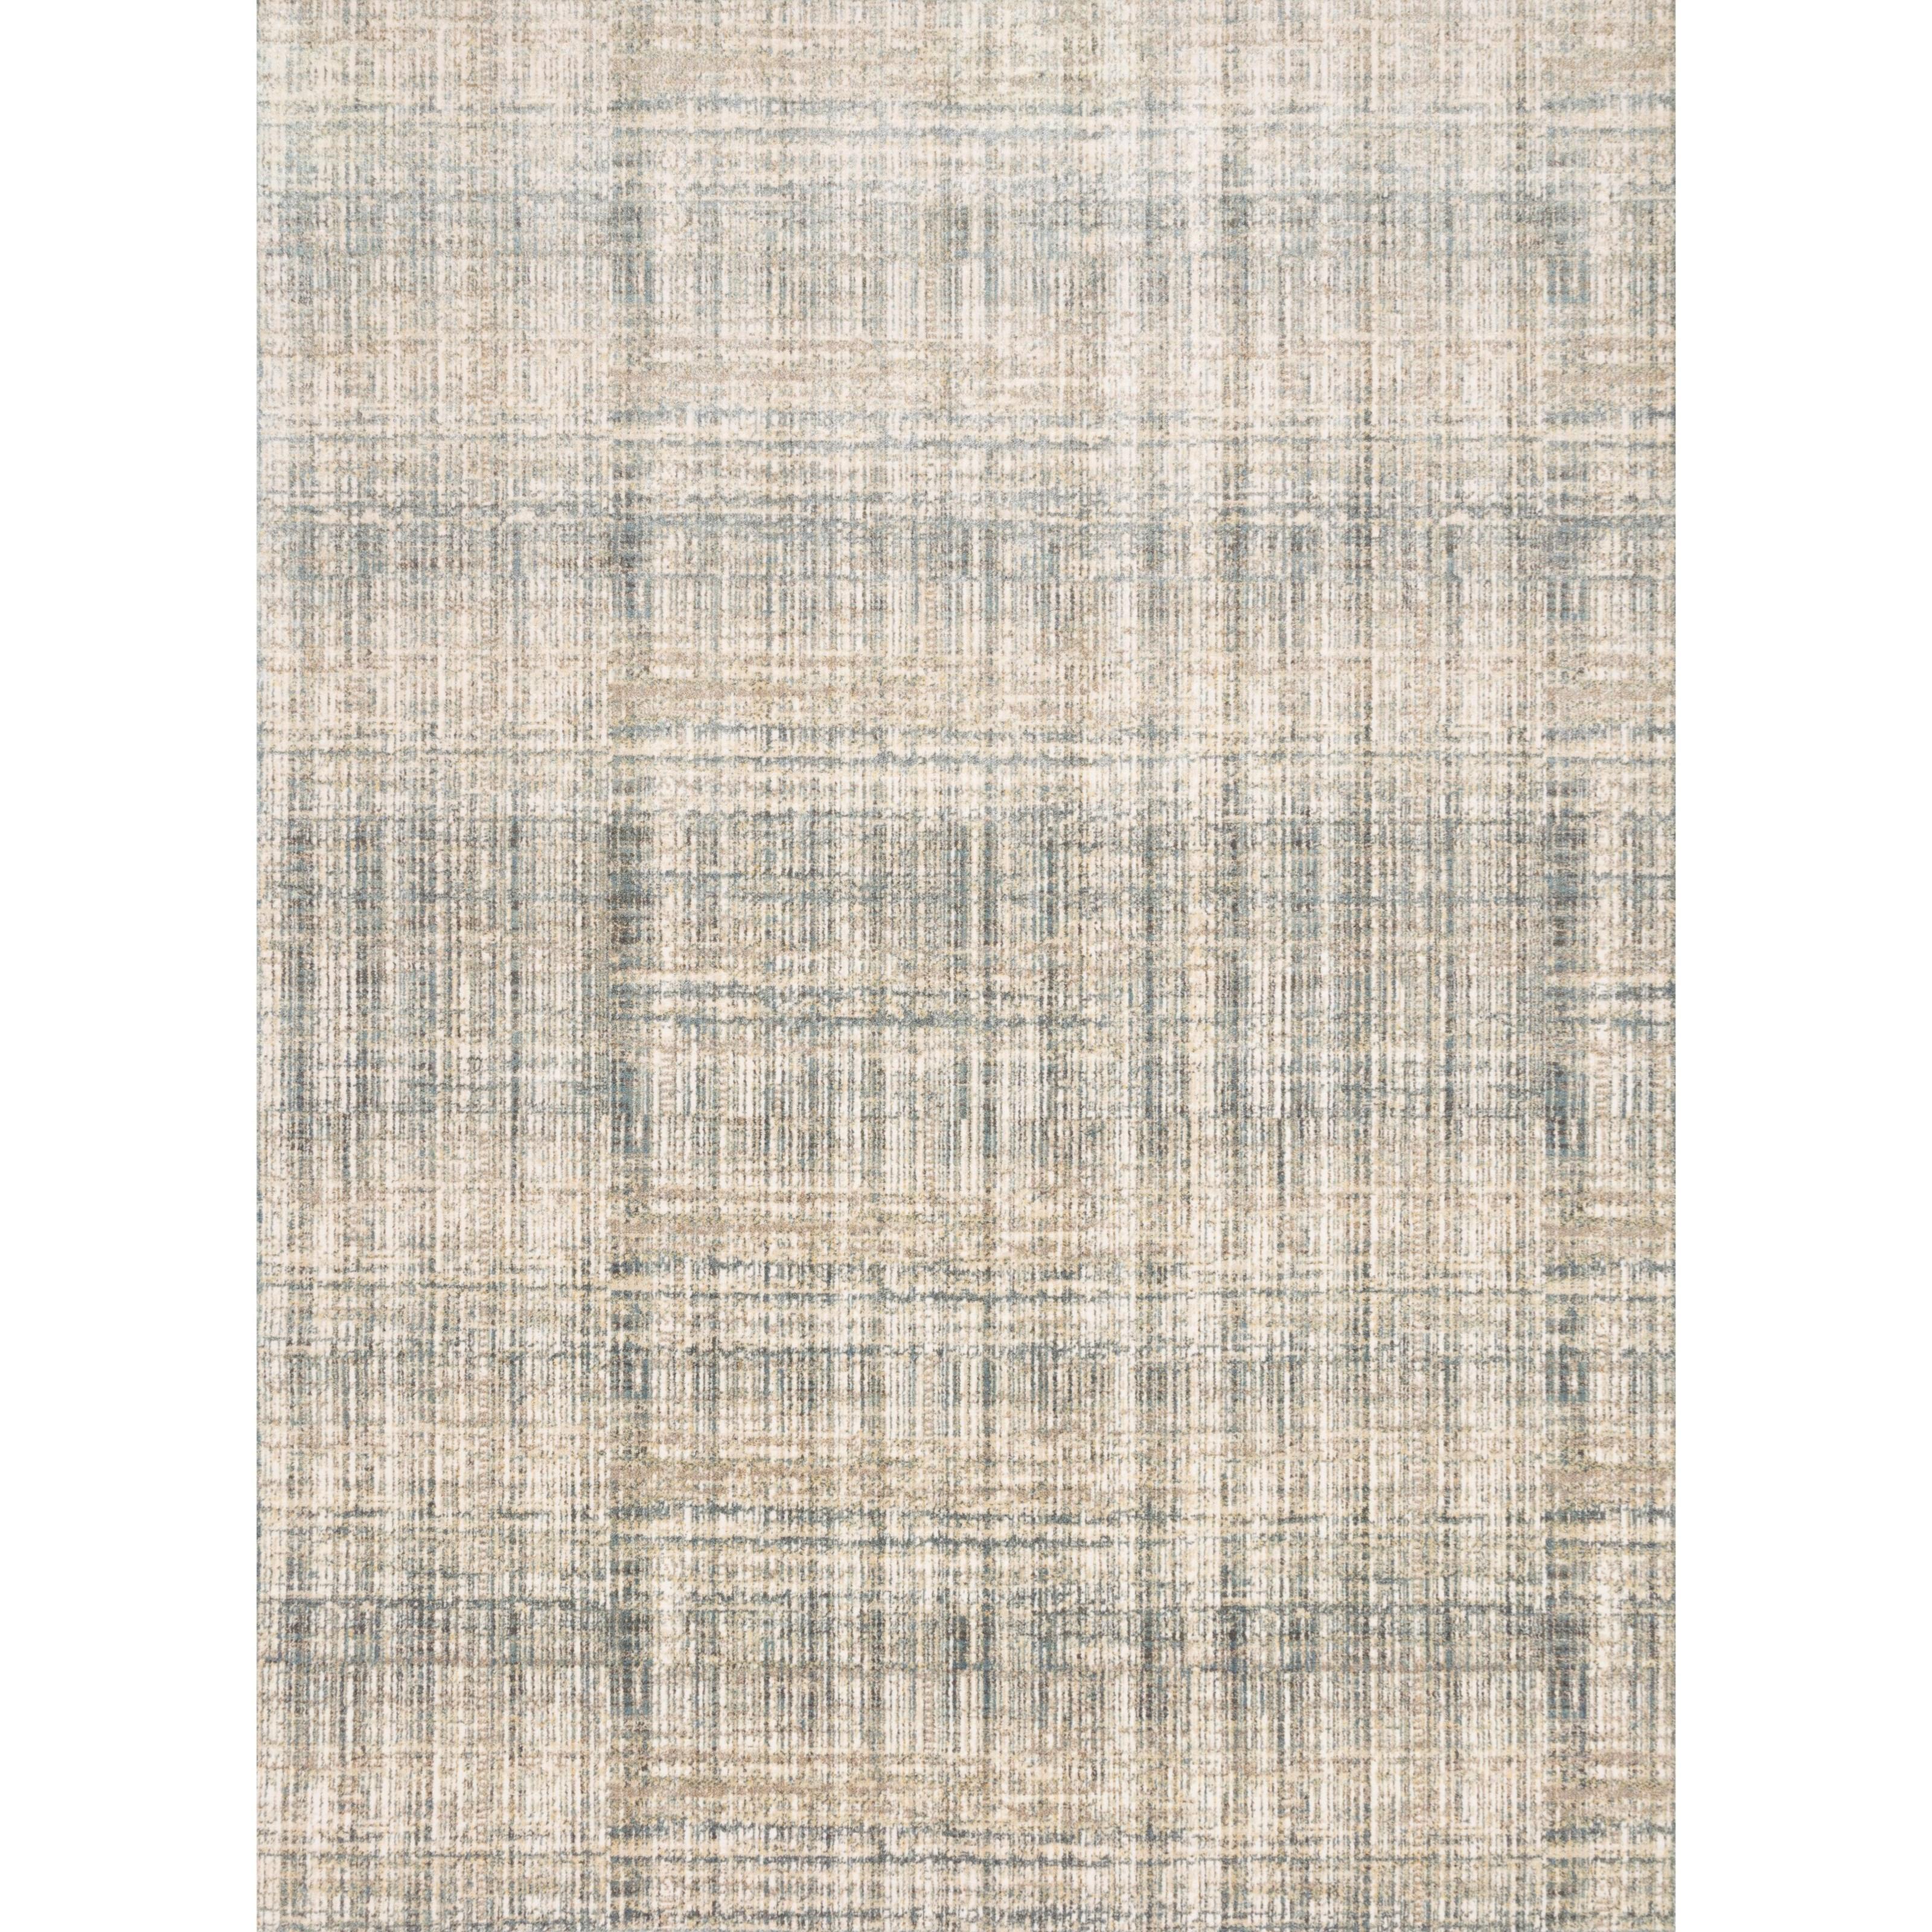 "Reid 5'3"" x 7'8"" Bluestone Rug by Loloi Rugs at Virginia Furniture Market"